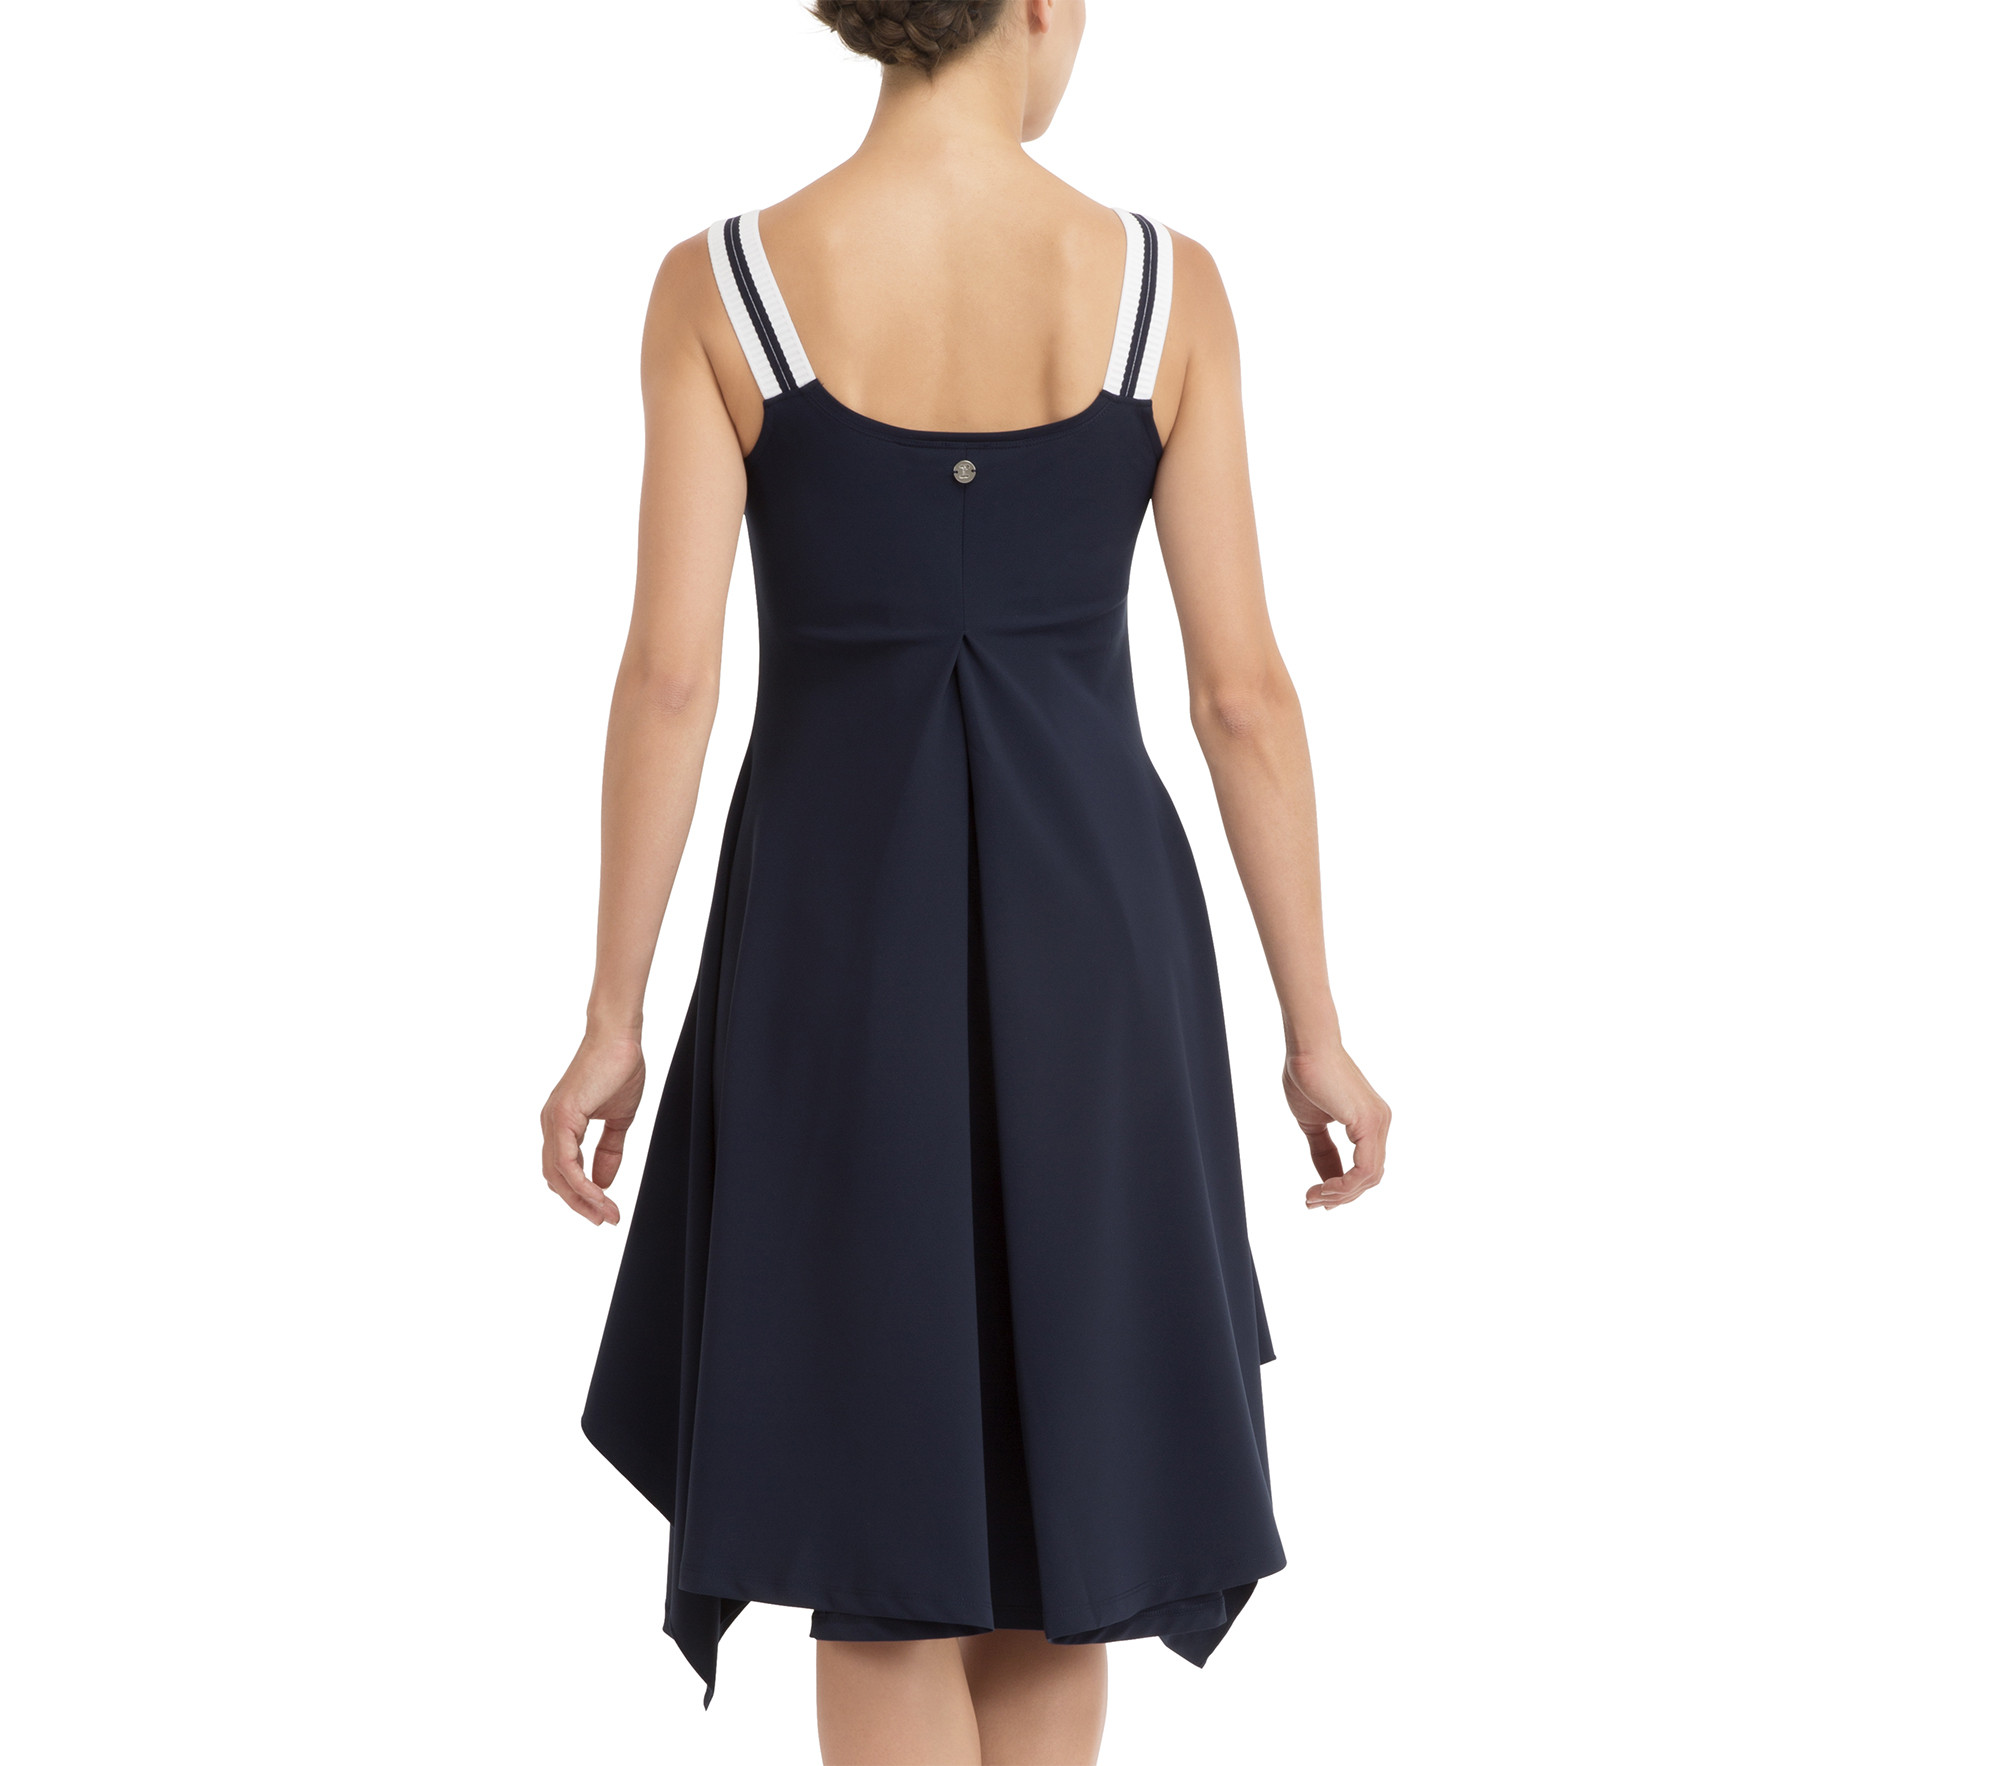 Asymmetrical technical dress